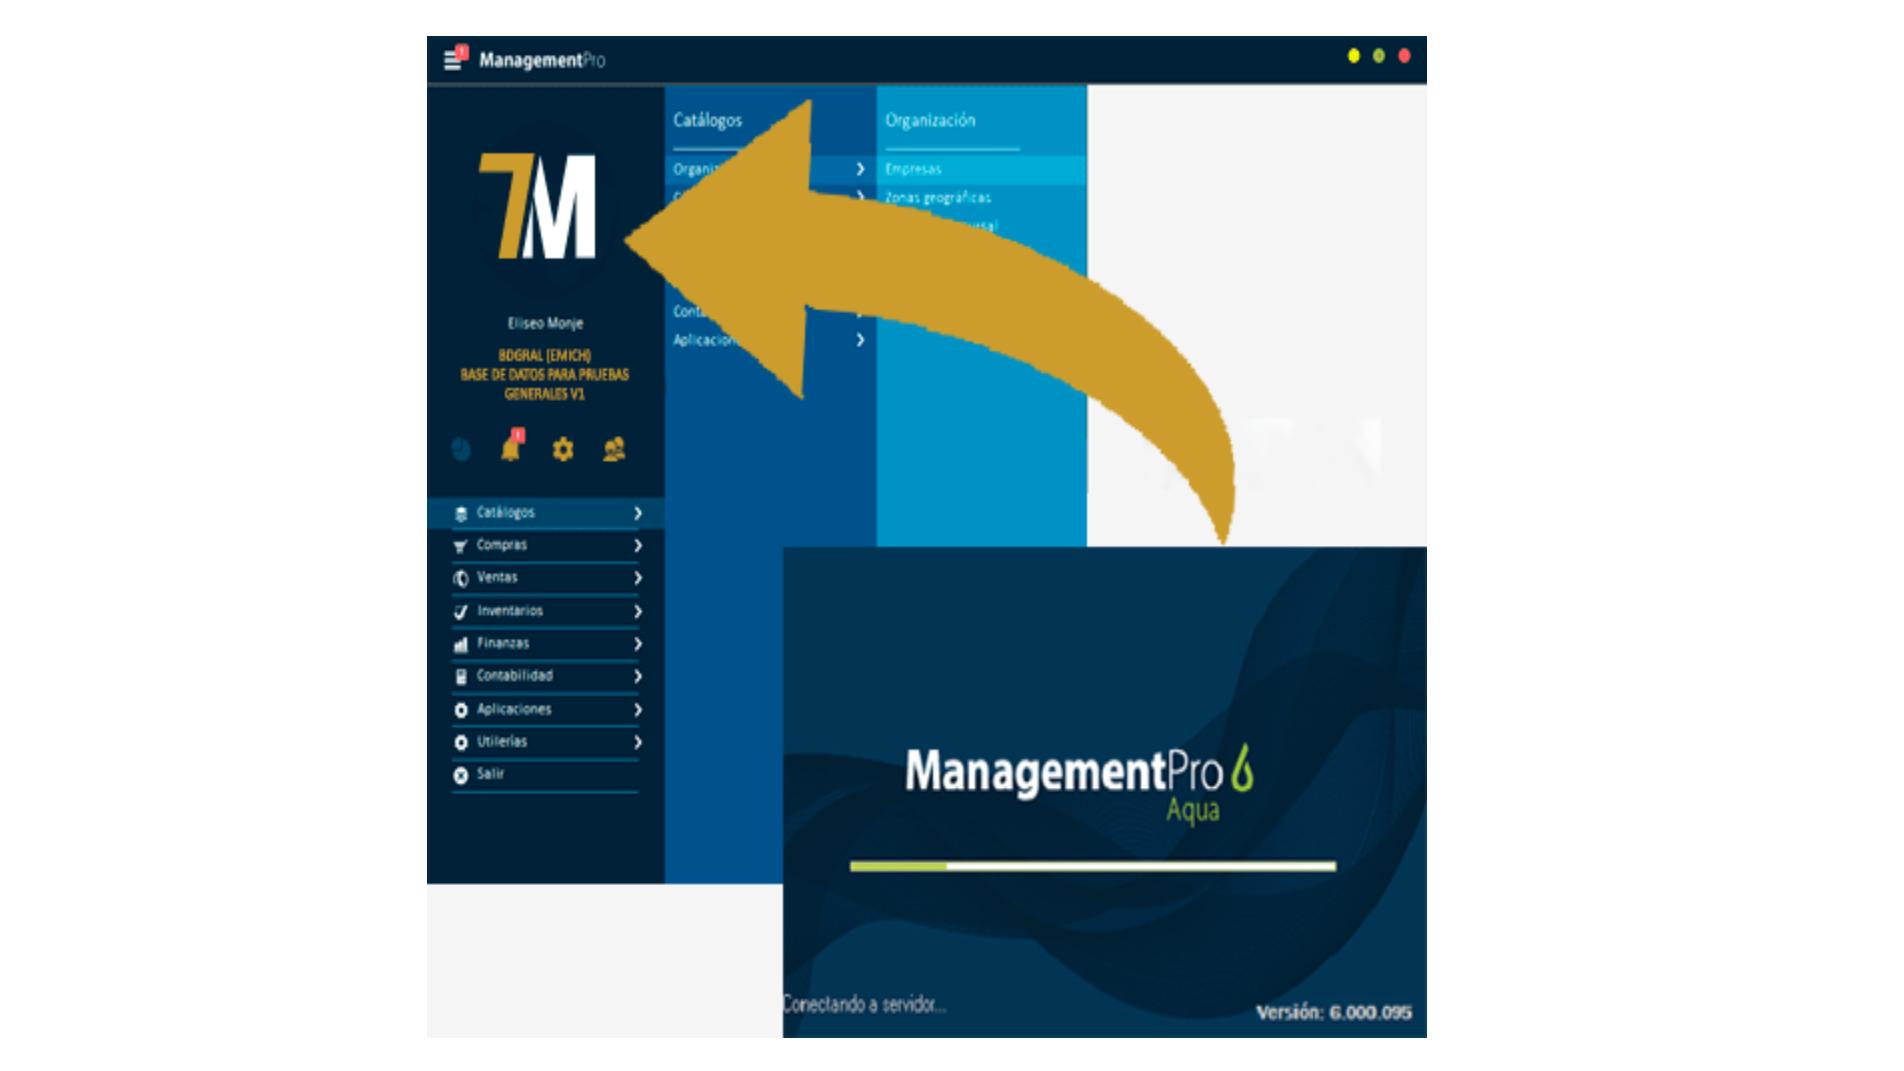 Actualización de ManagementPro 7 Terra